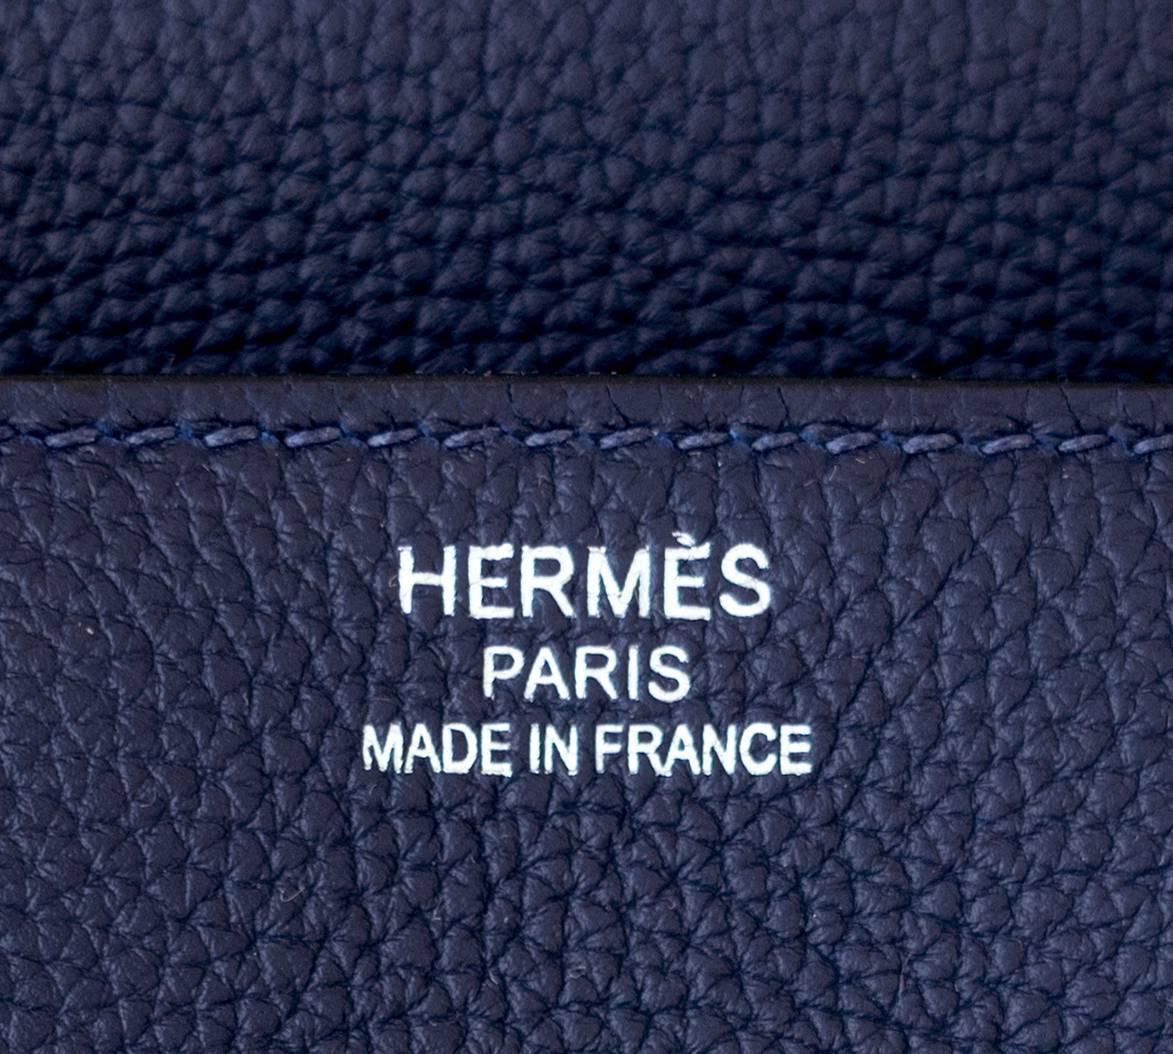 1b4a6f9ec1 Hermes Navy Blue Nuit Togo 35cm Birkin Palladium Hardware Jewel-Toned Navy  at 1stdibs